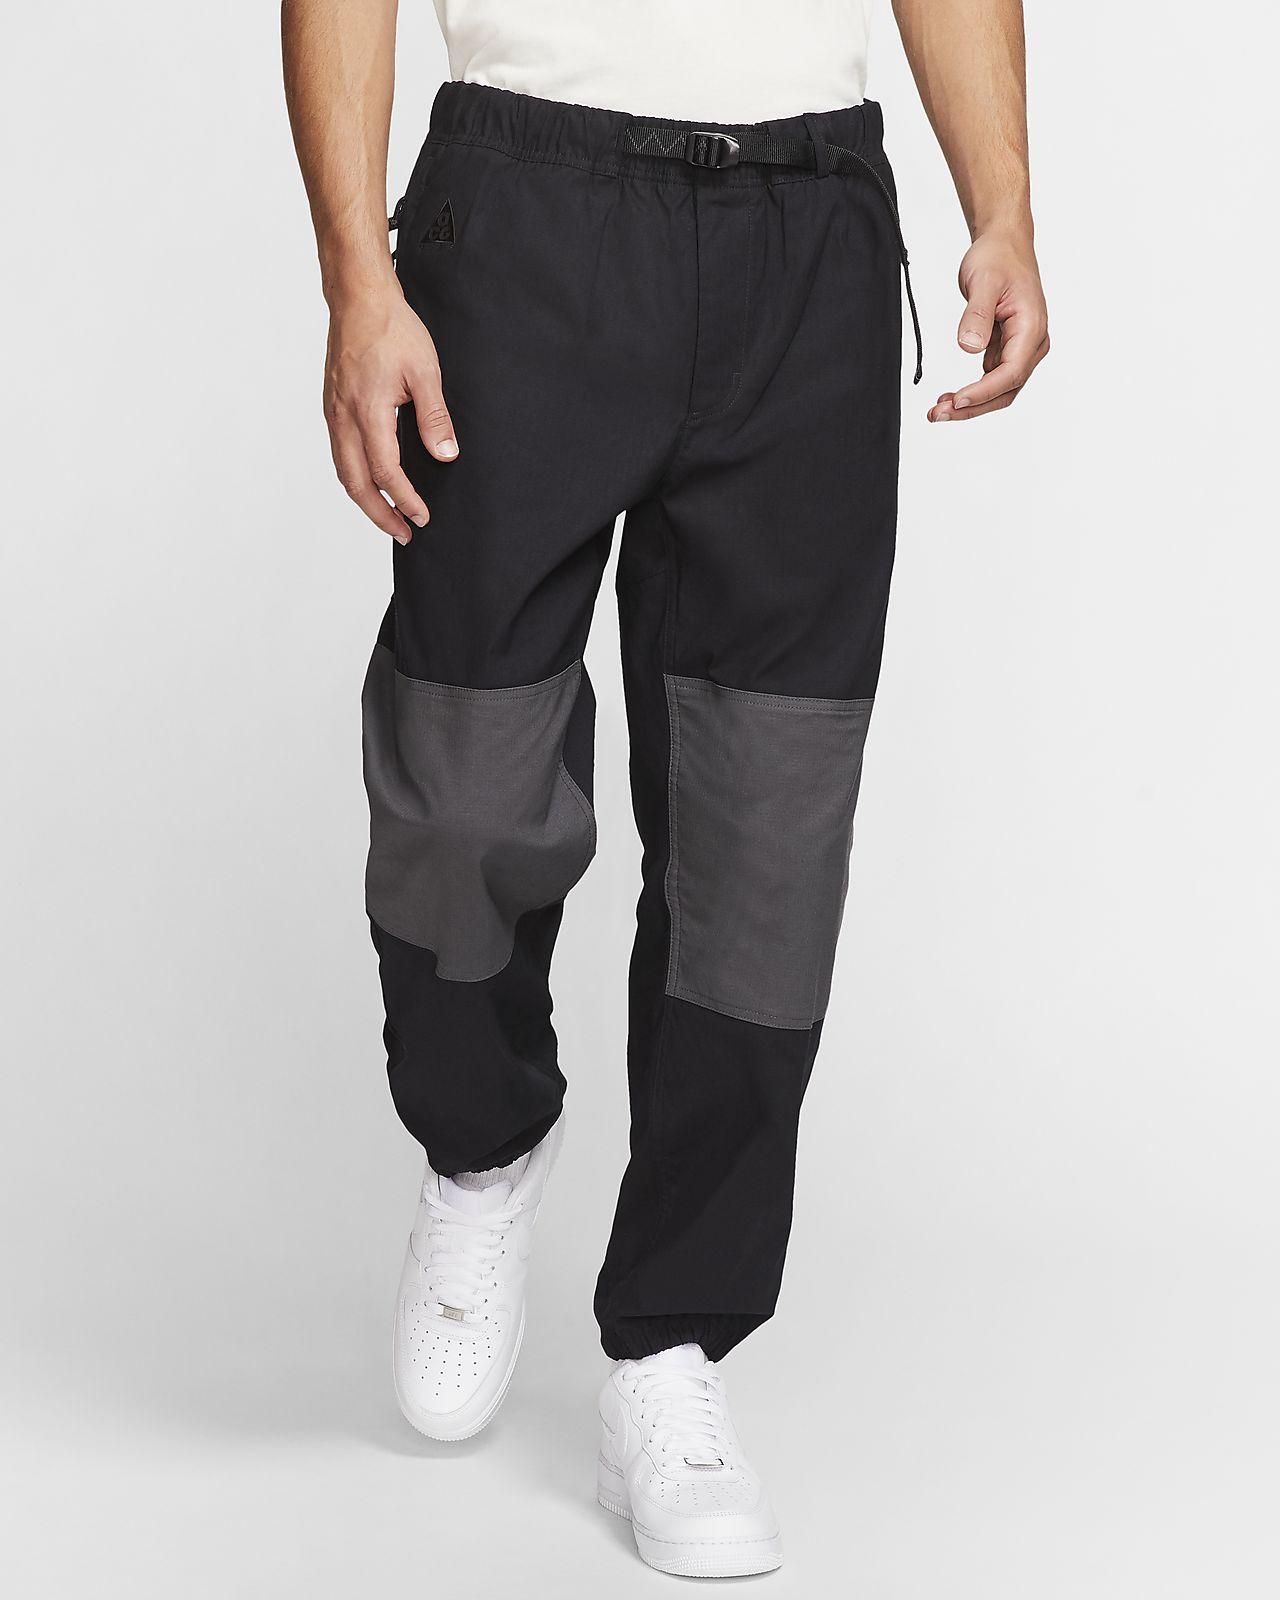 Nike ACG Herren-Trailhose